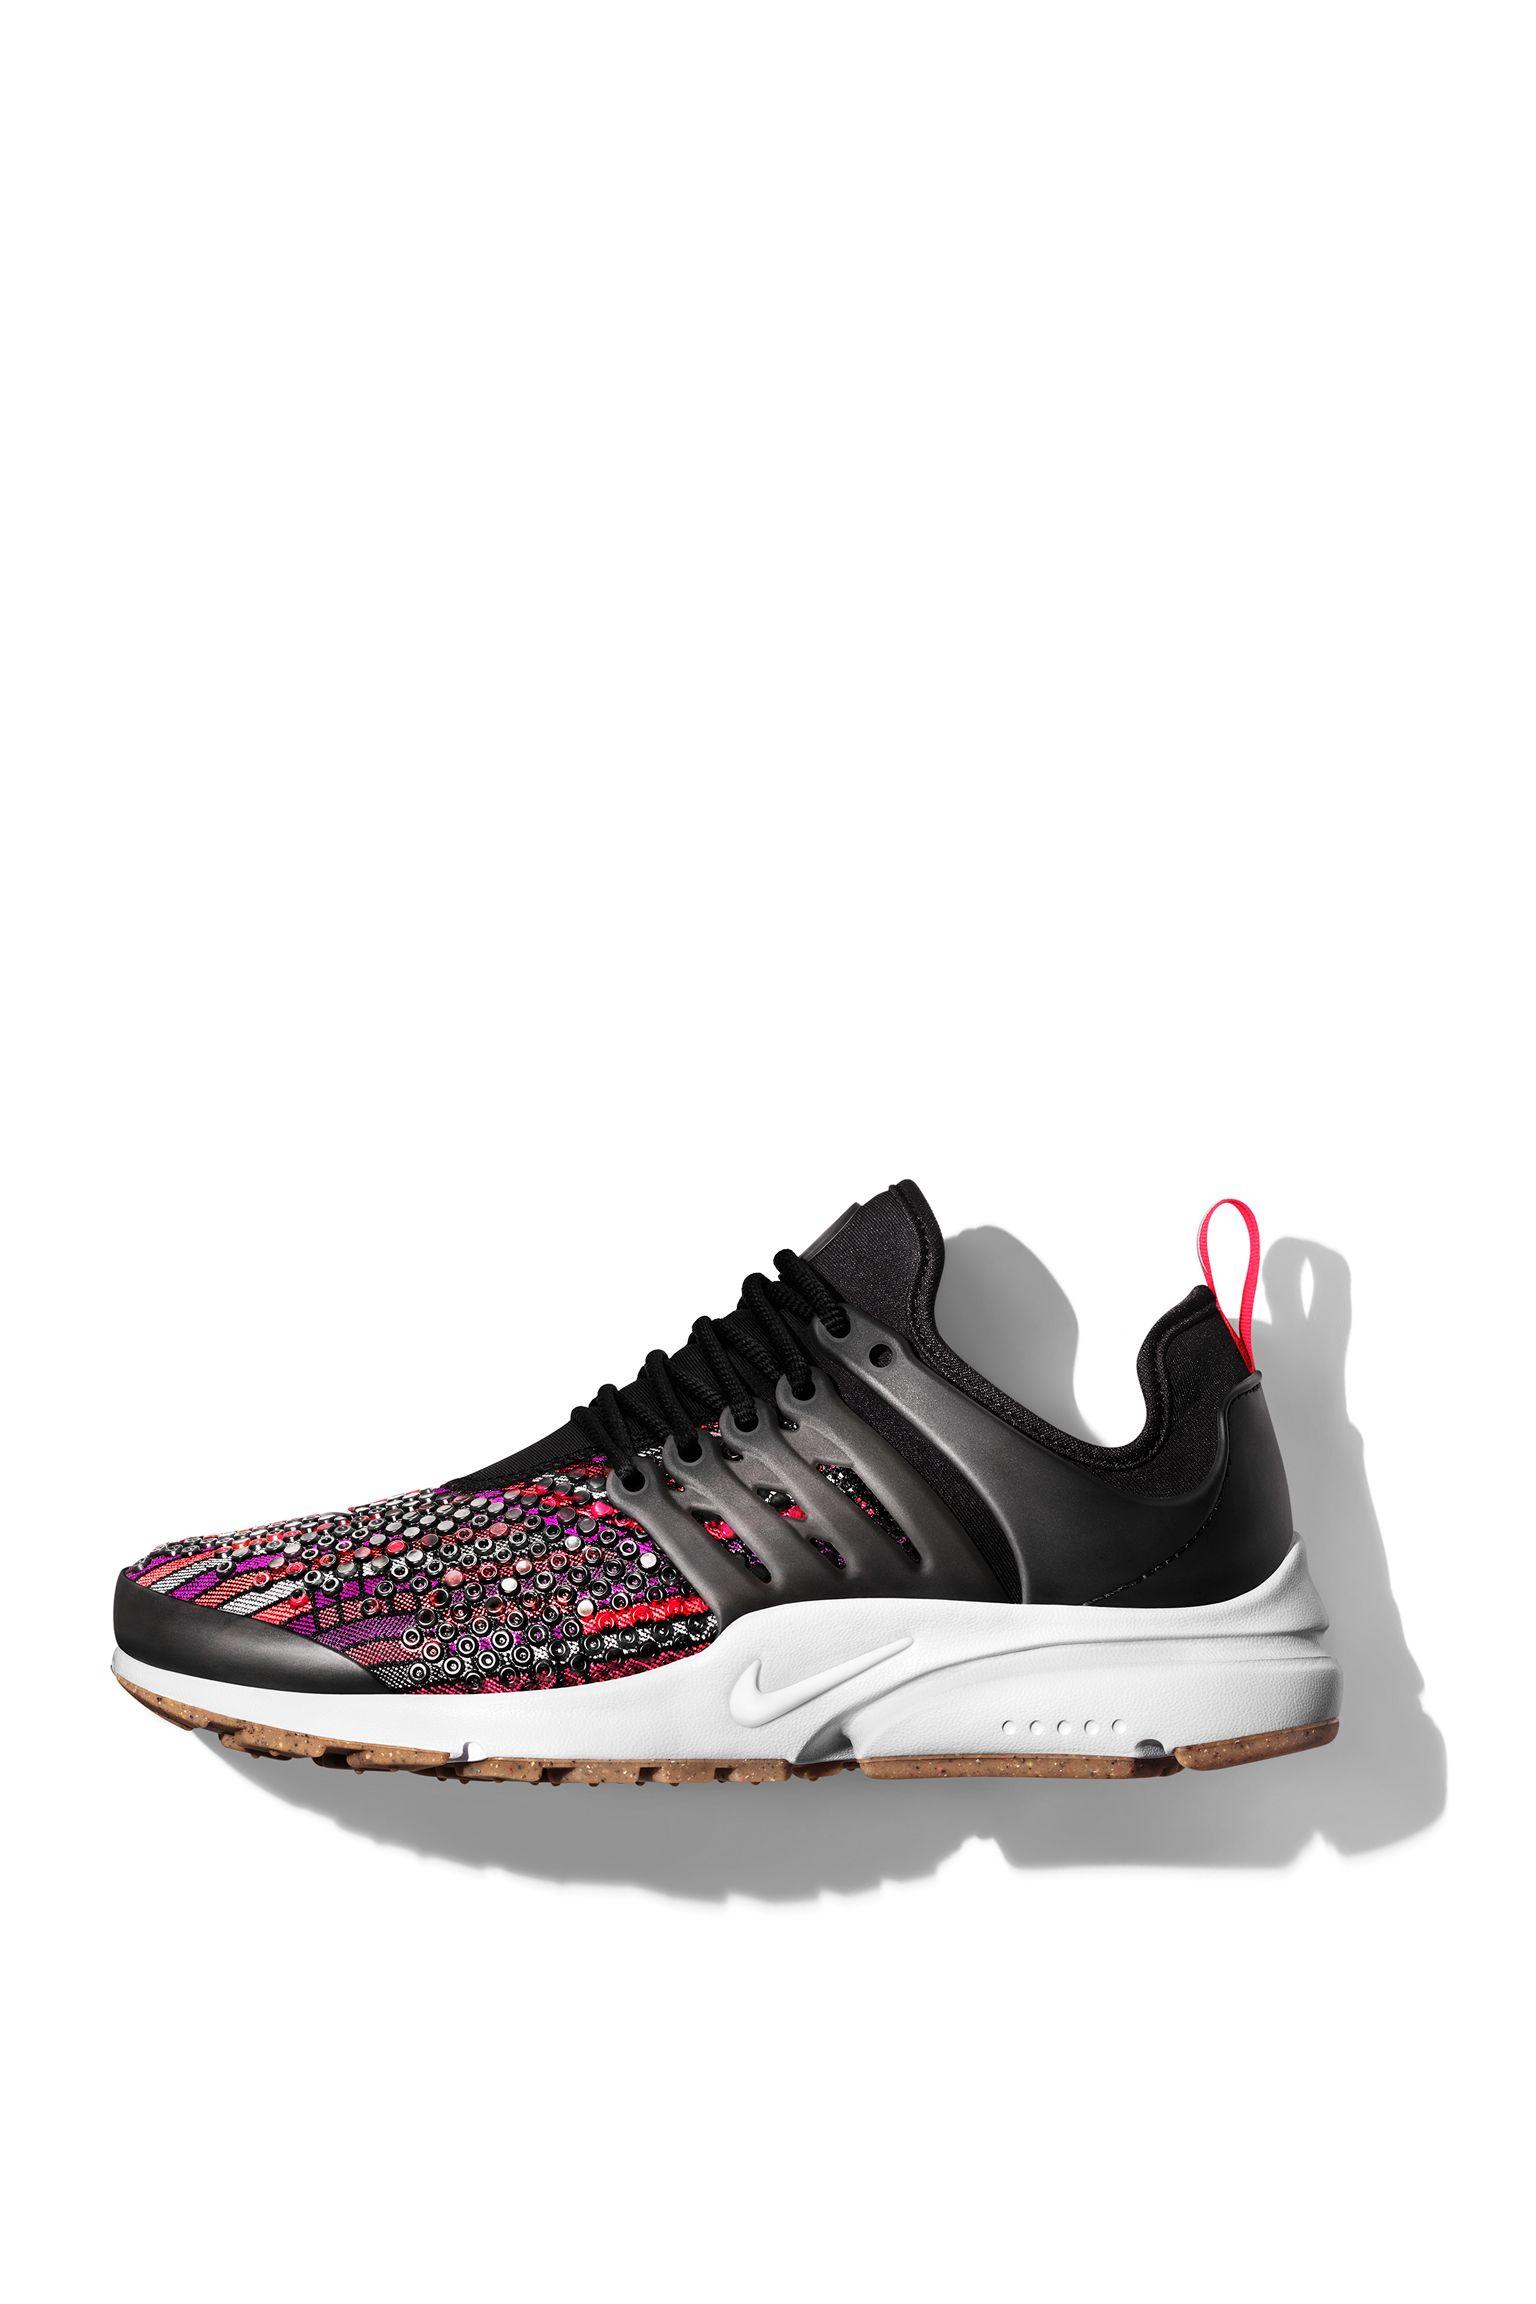 Collection Nike Beautiful x Powerful Jacquard